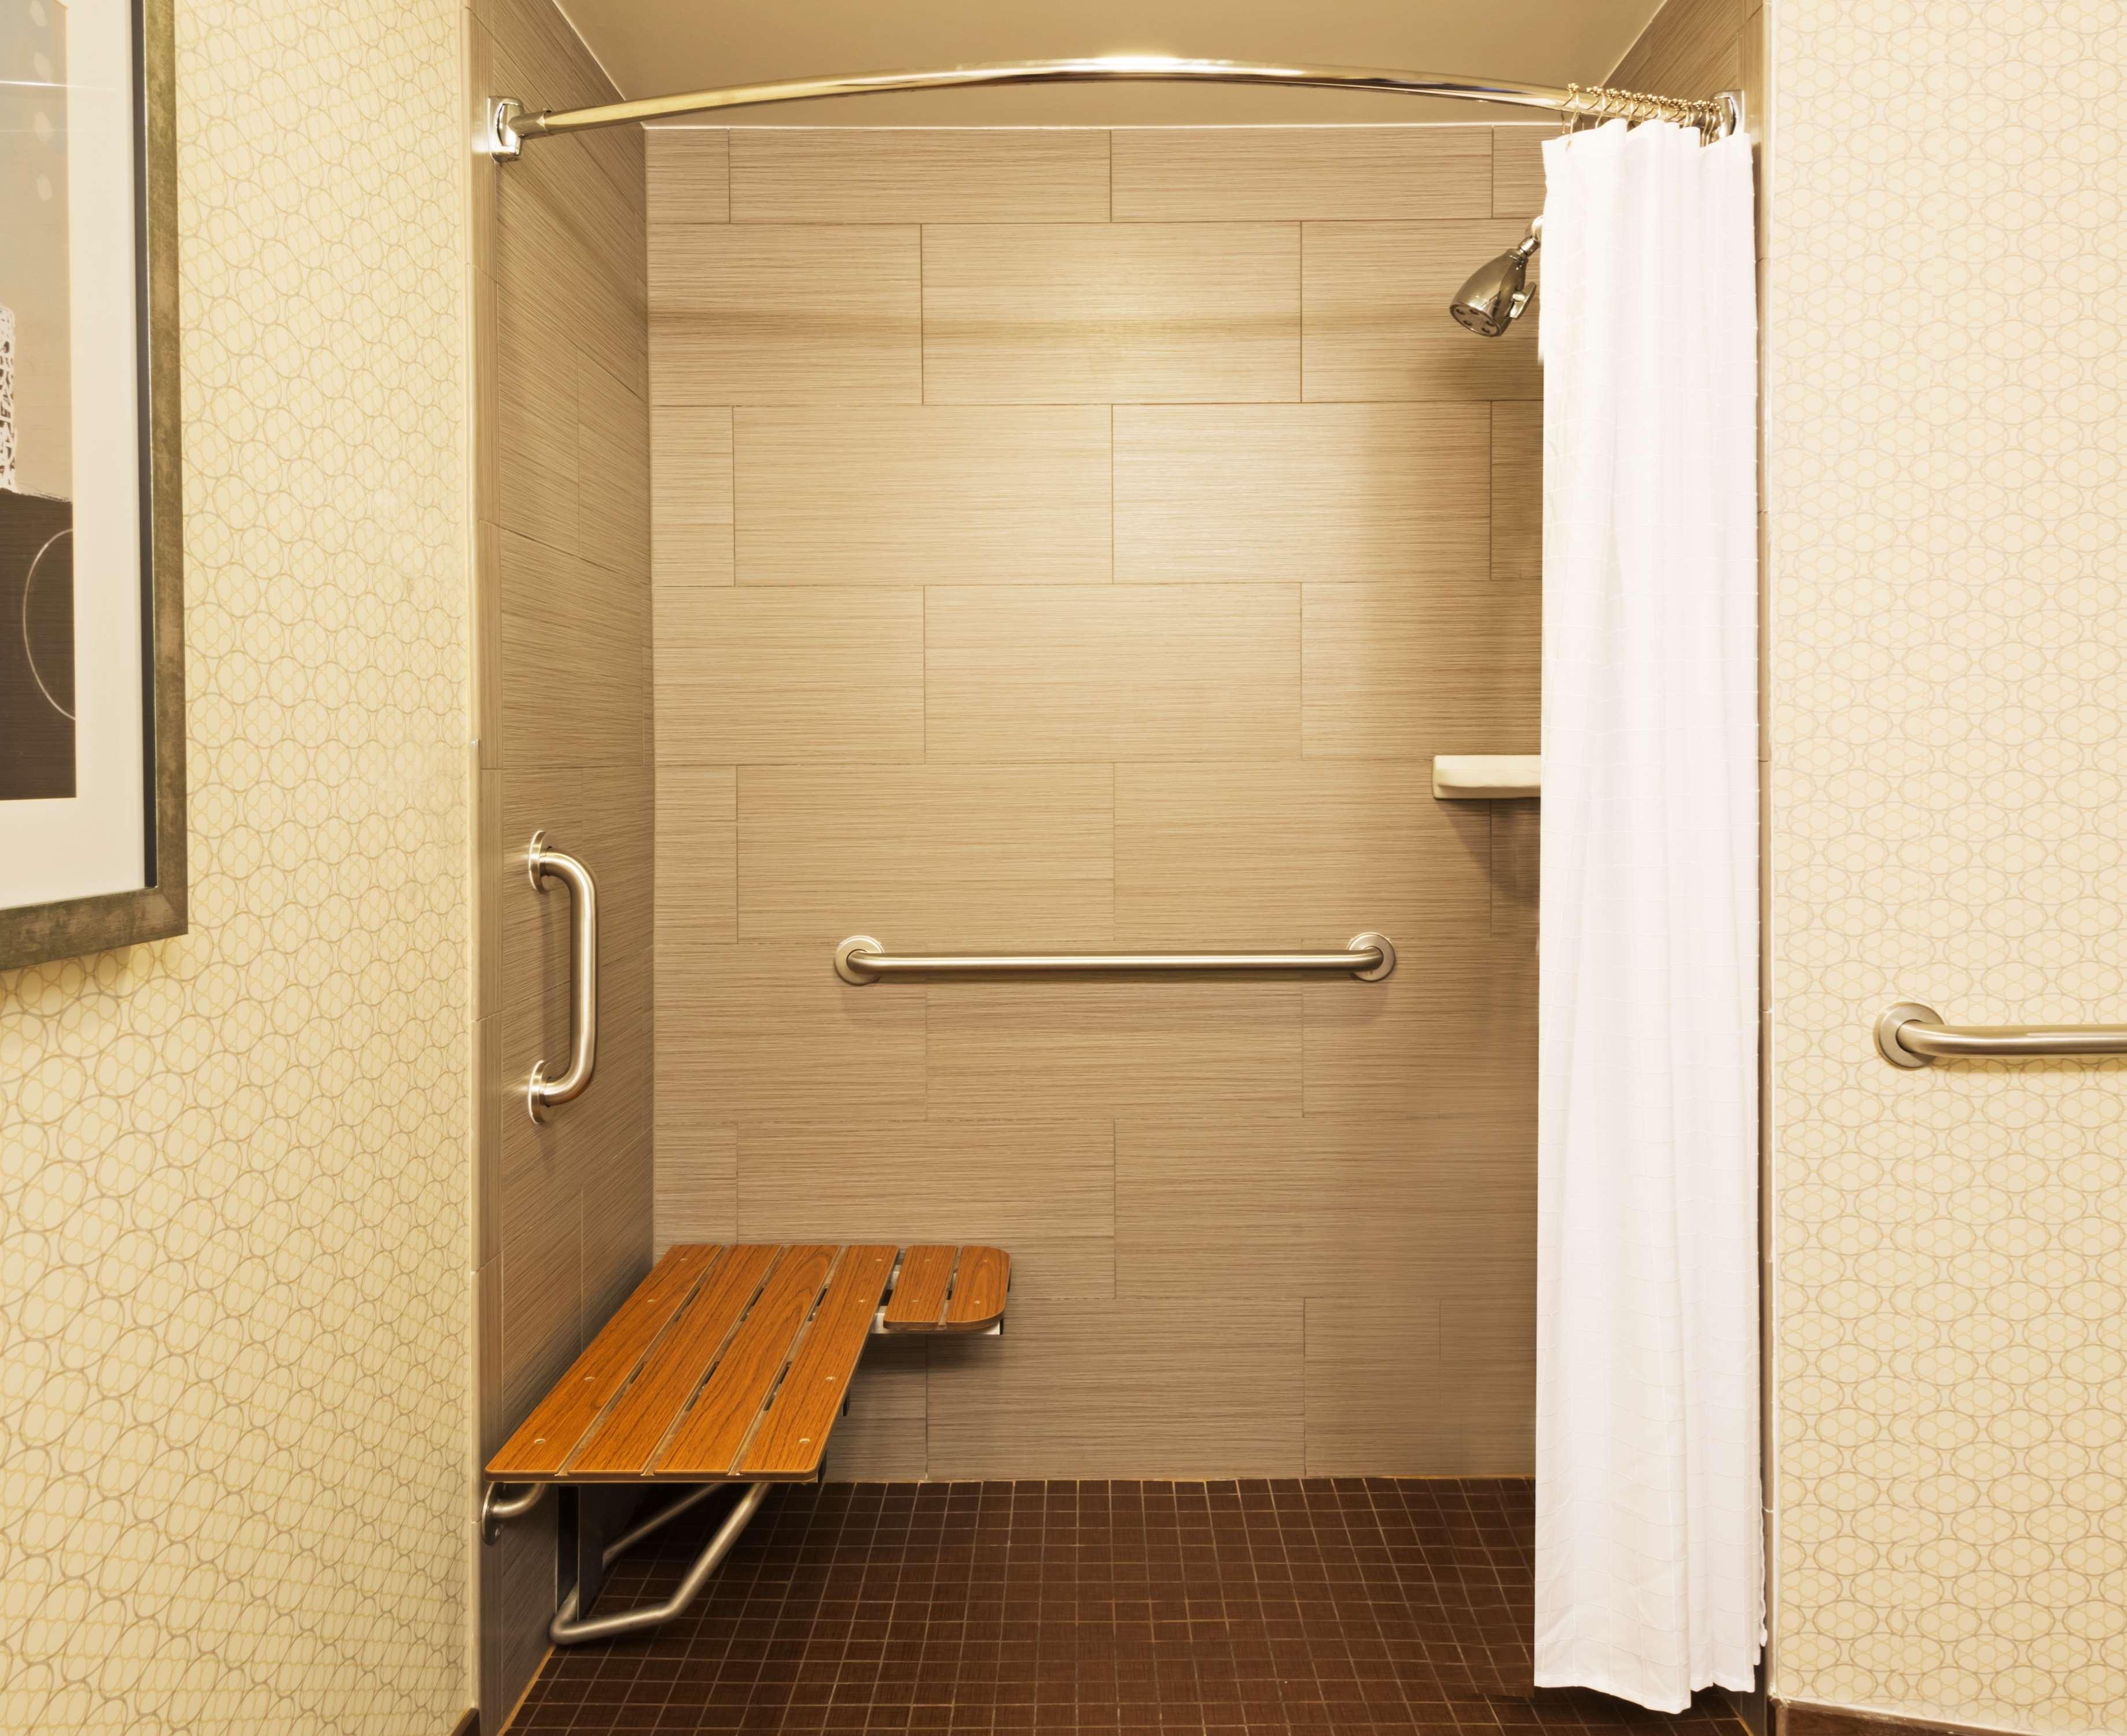 DoubleTree Suites by Hilton Hotel Austin image 4